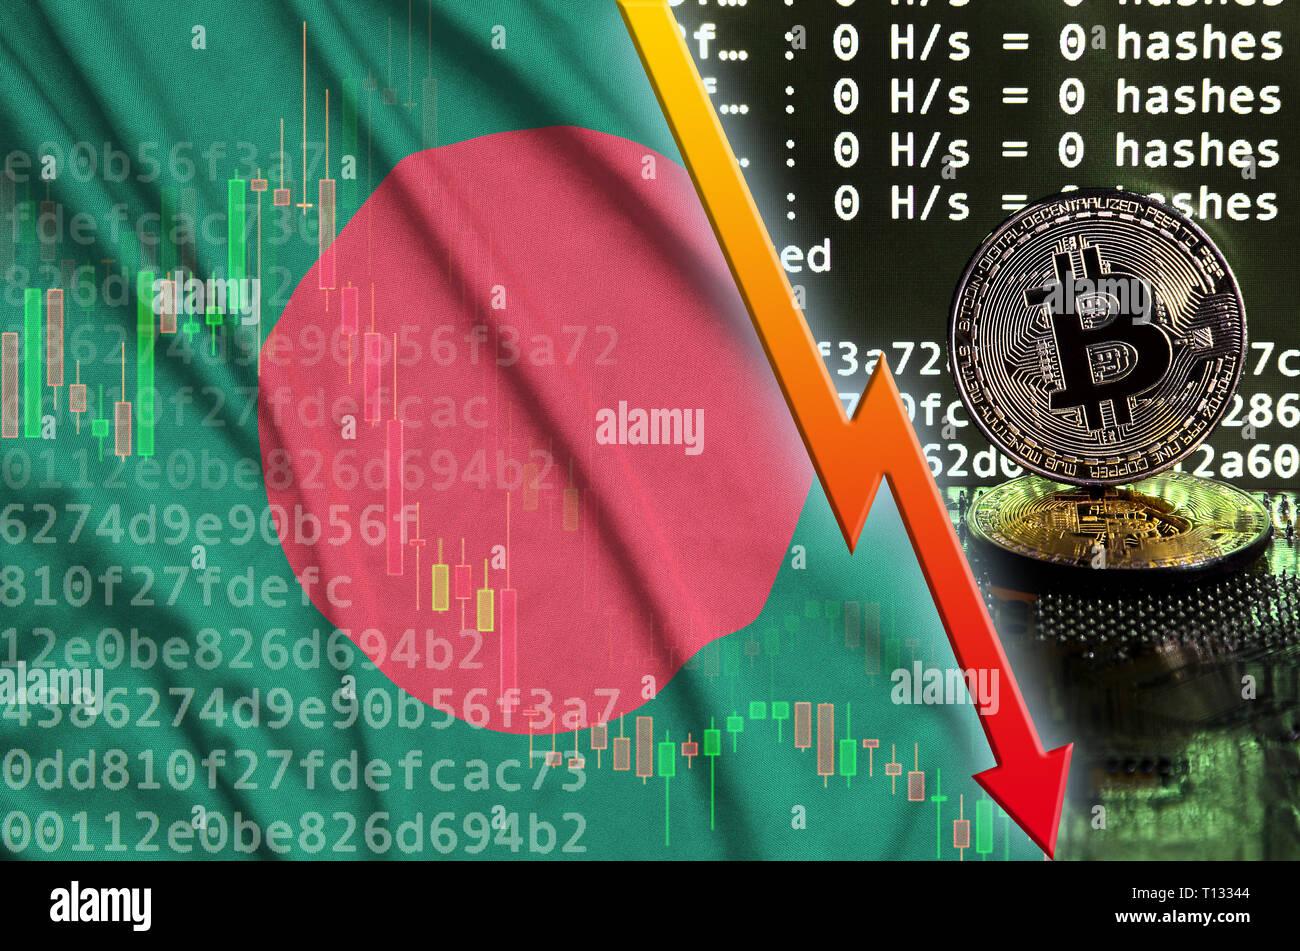 Hur farmar man bitcoins stock ufc 160 betting guide